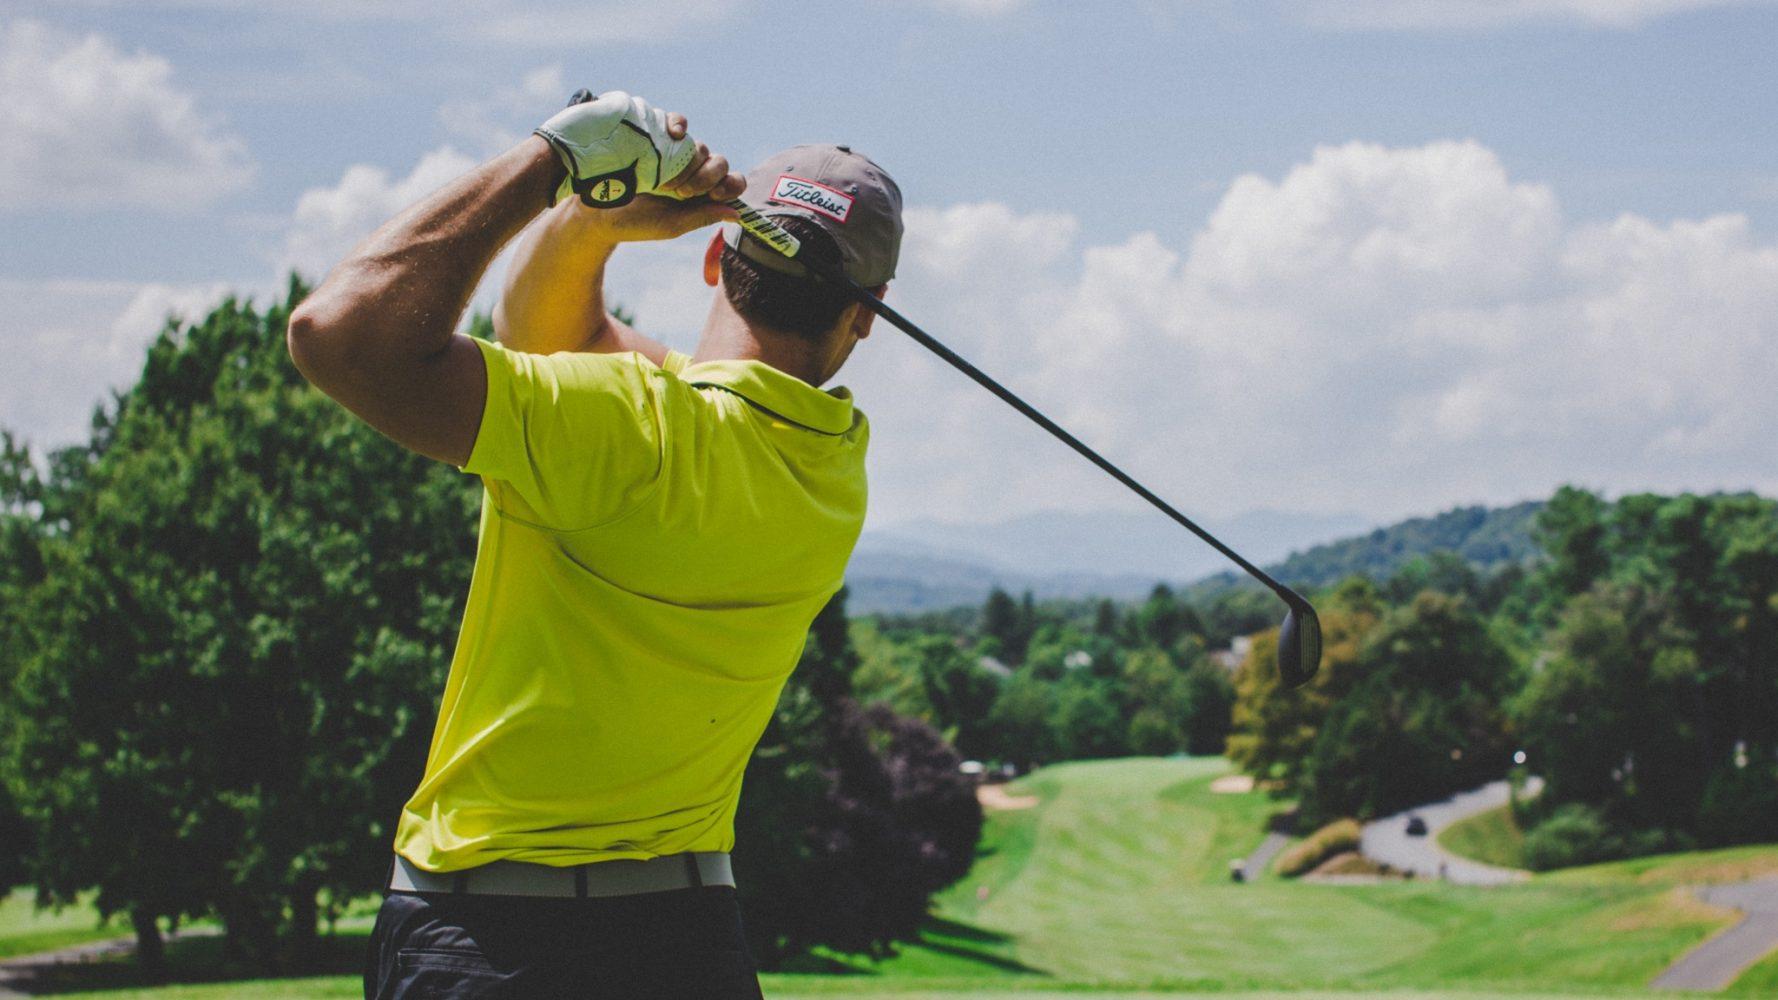 Flywheel Training and Golf